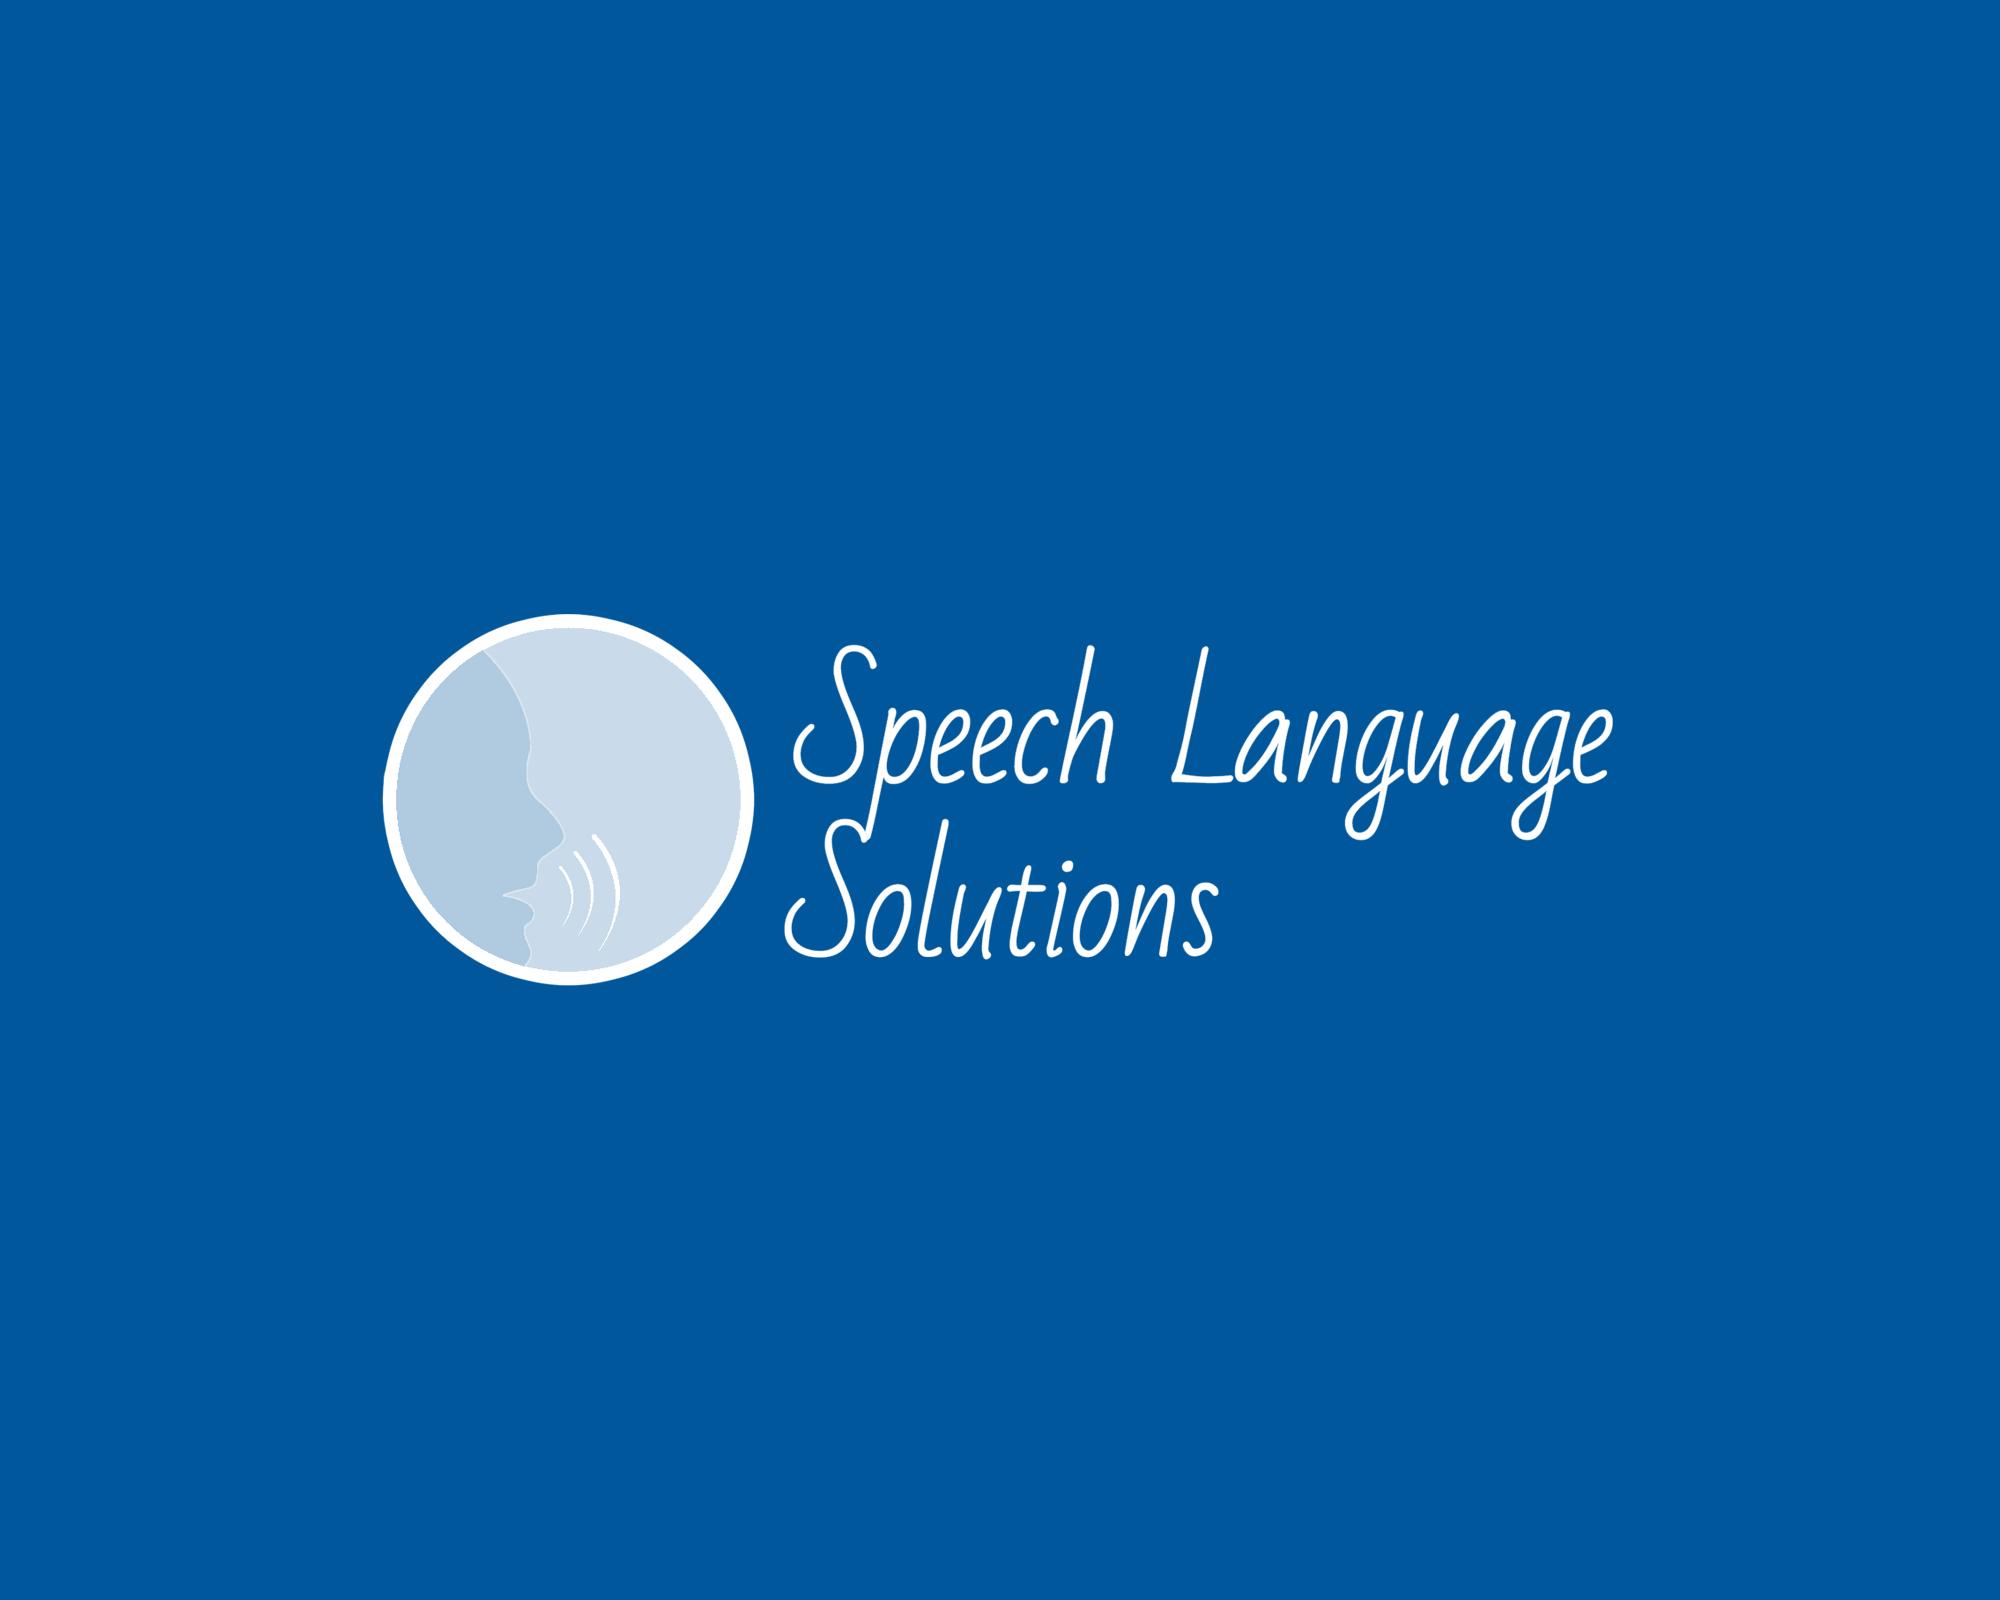 speech language solutions Logo